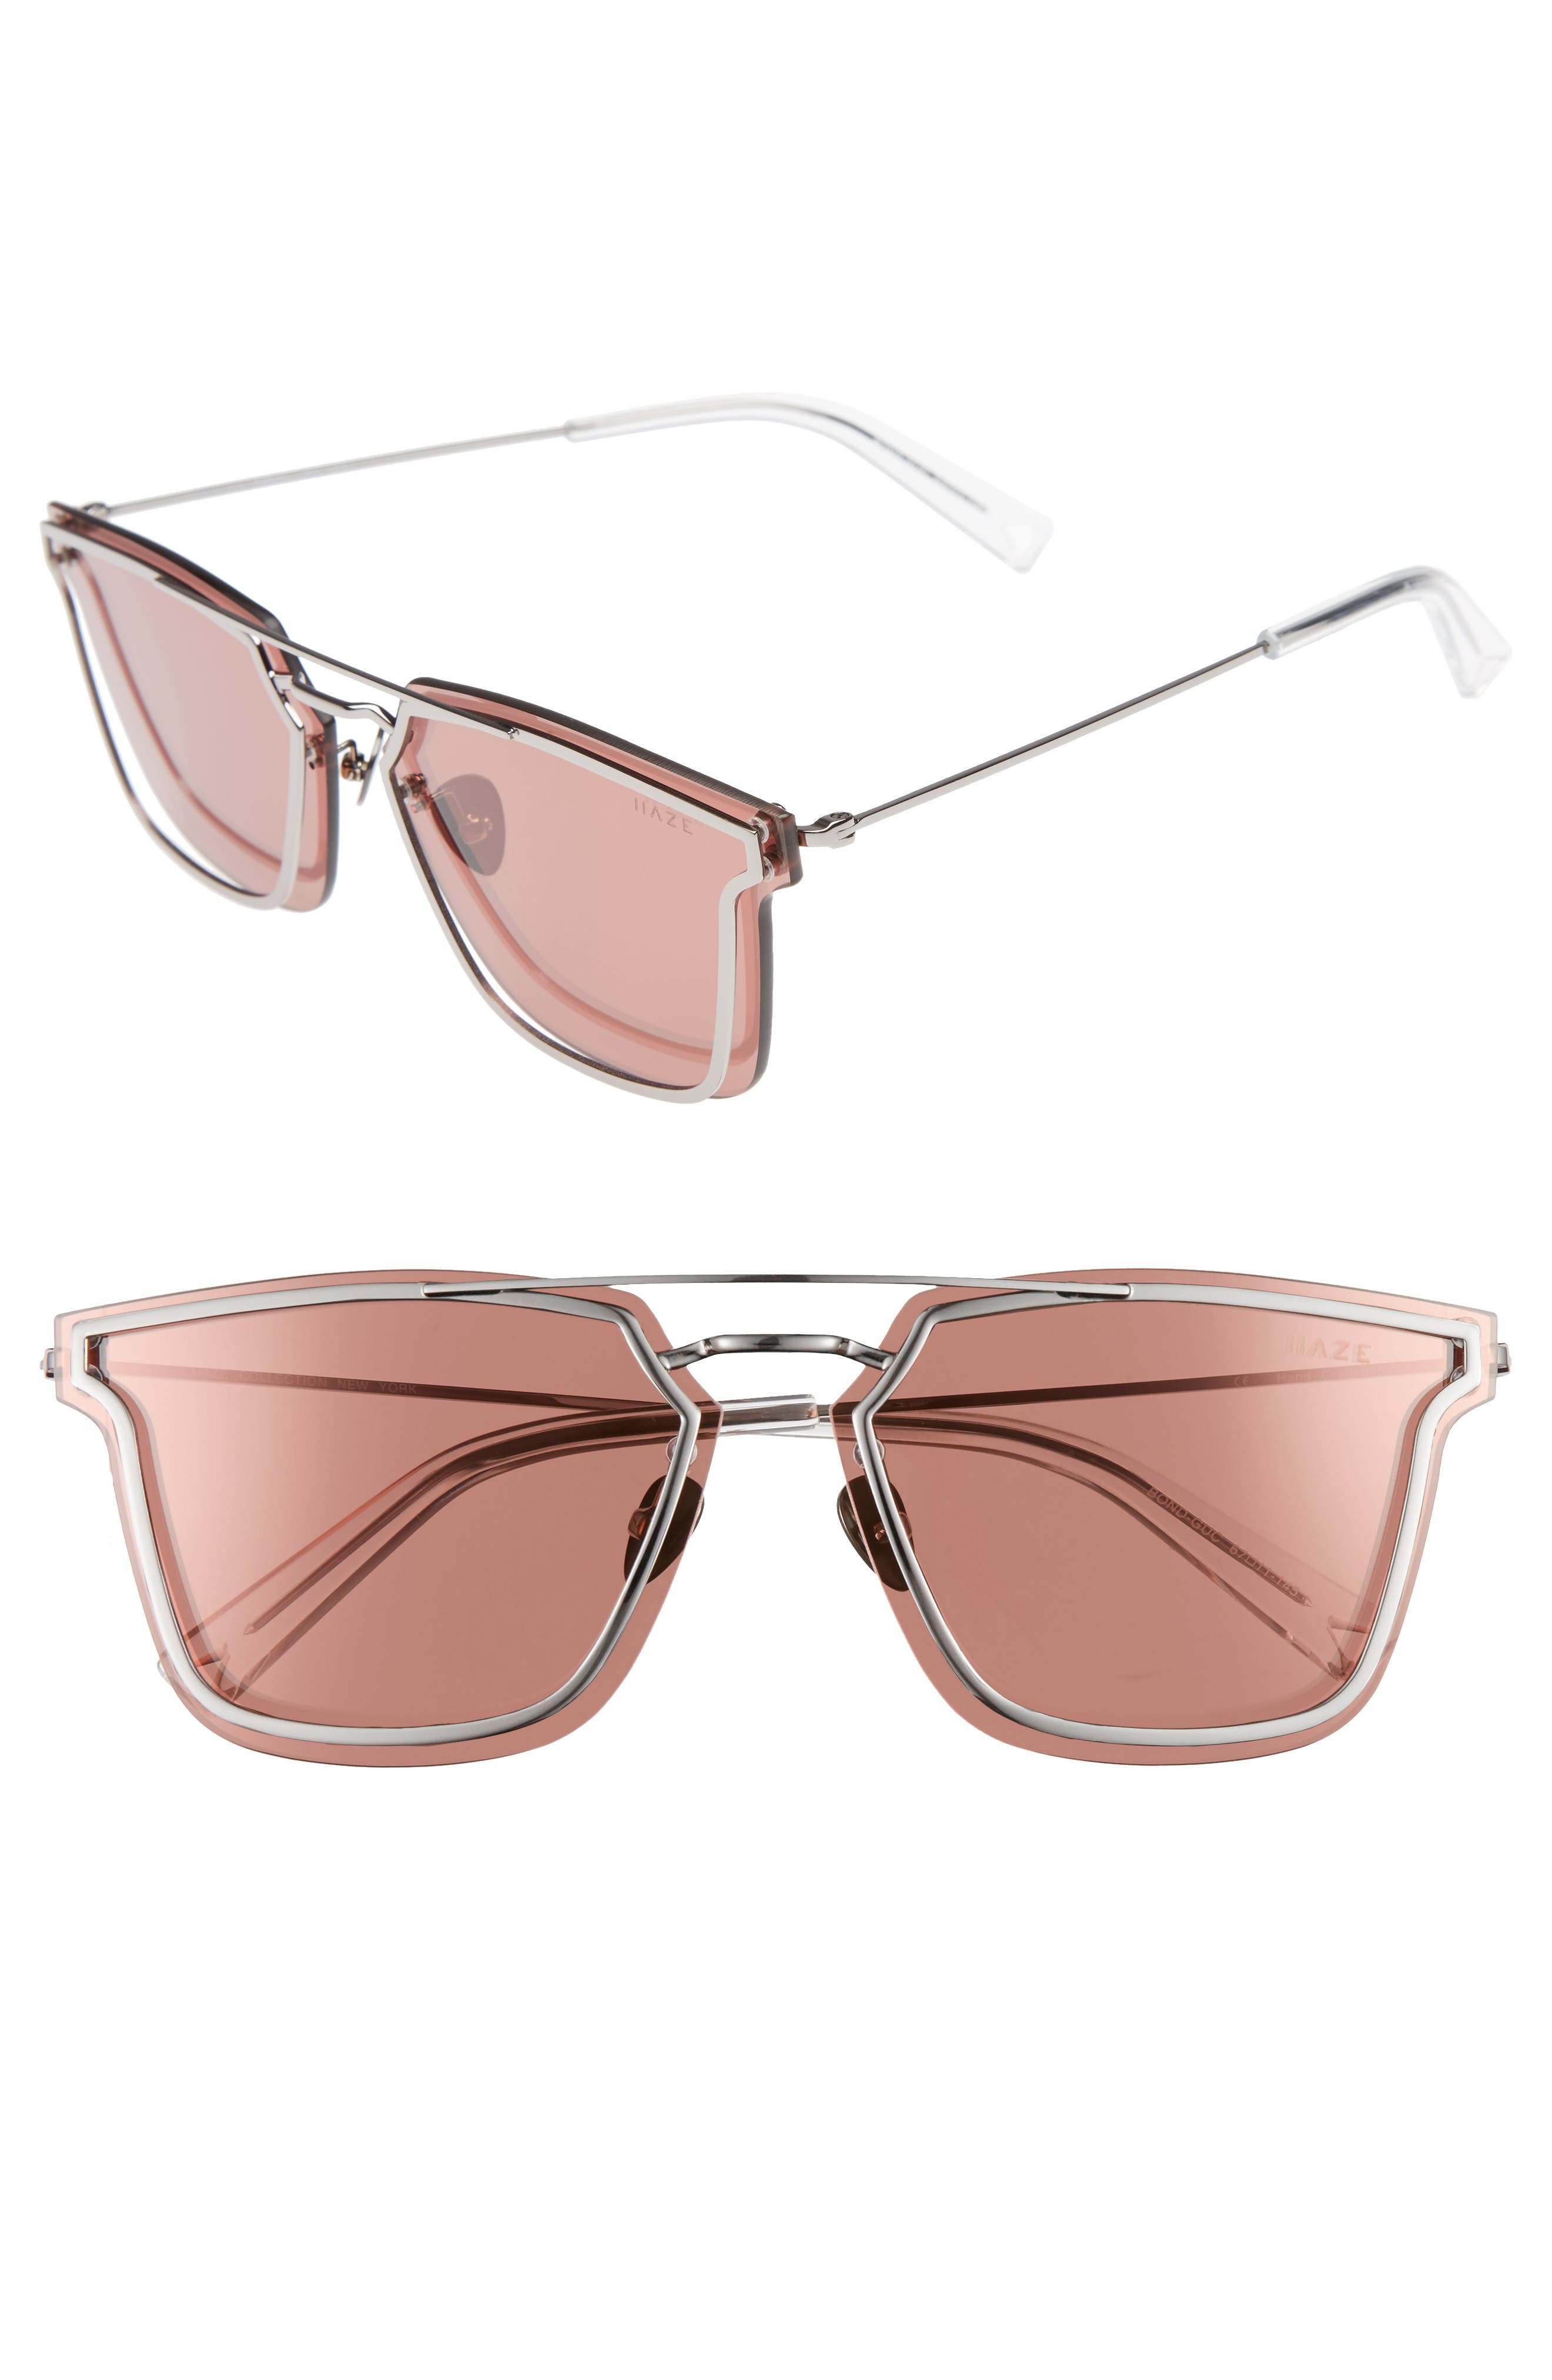 Bond 67mm Oversize Mirrored Sunglasses,                             Main thumbnail 1, color,                             040